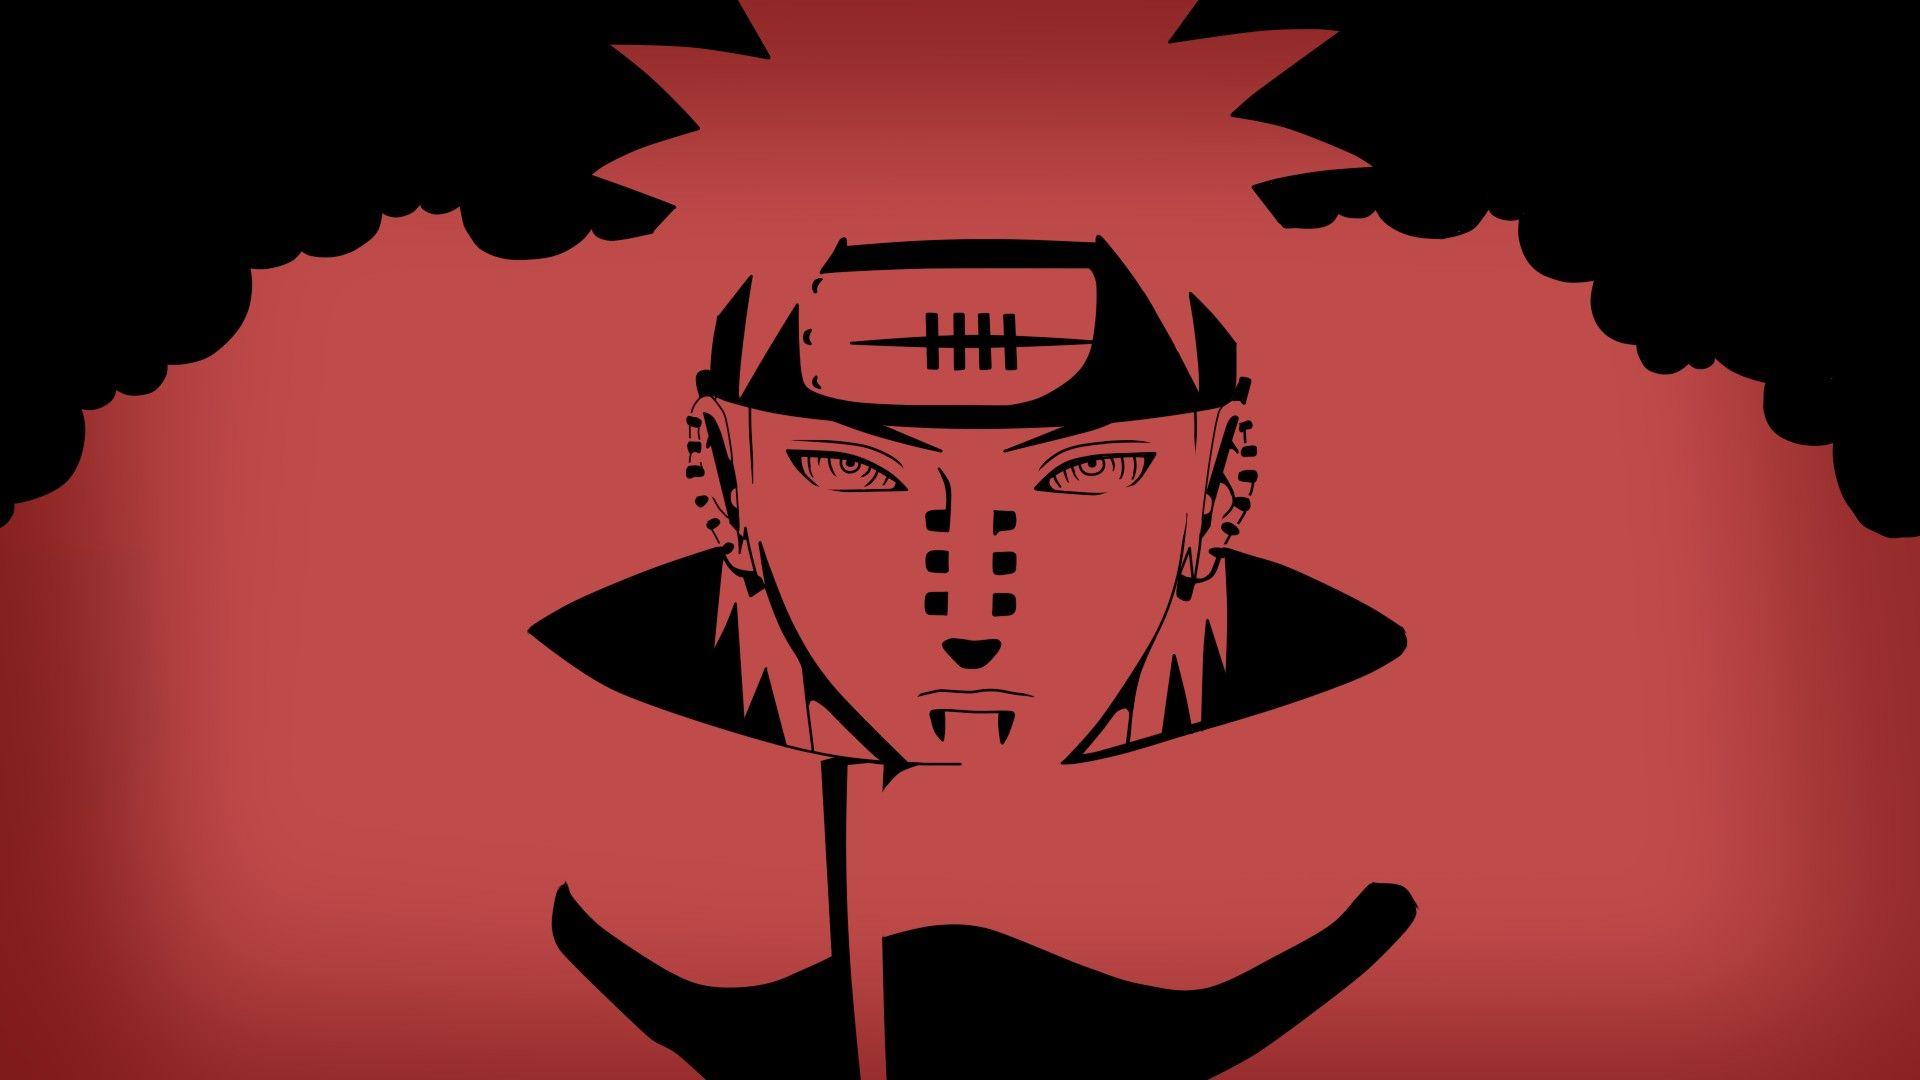 Naruto Shippuden Wallpaper 4k Pc Gallery Check More At Https